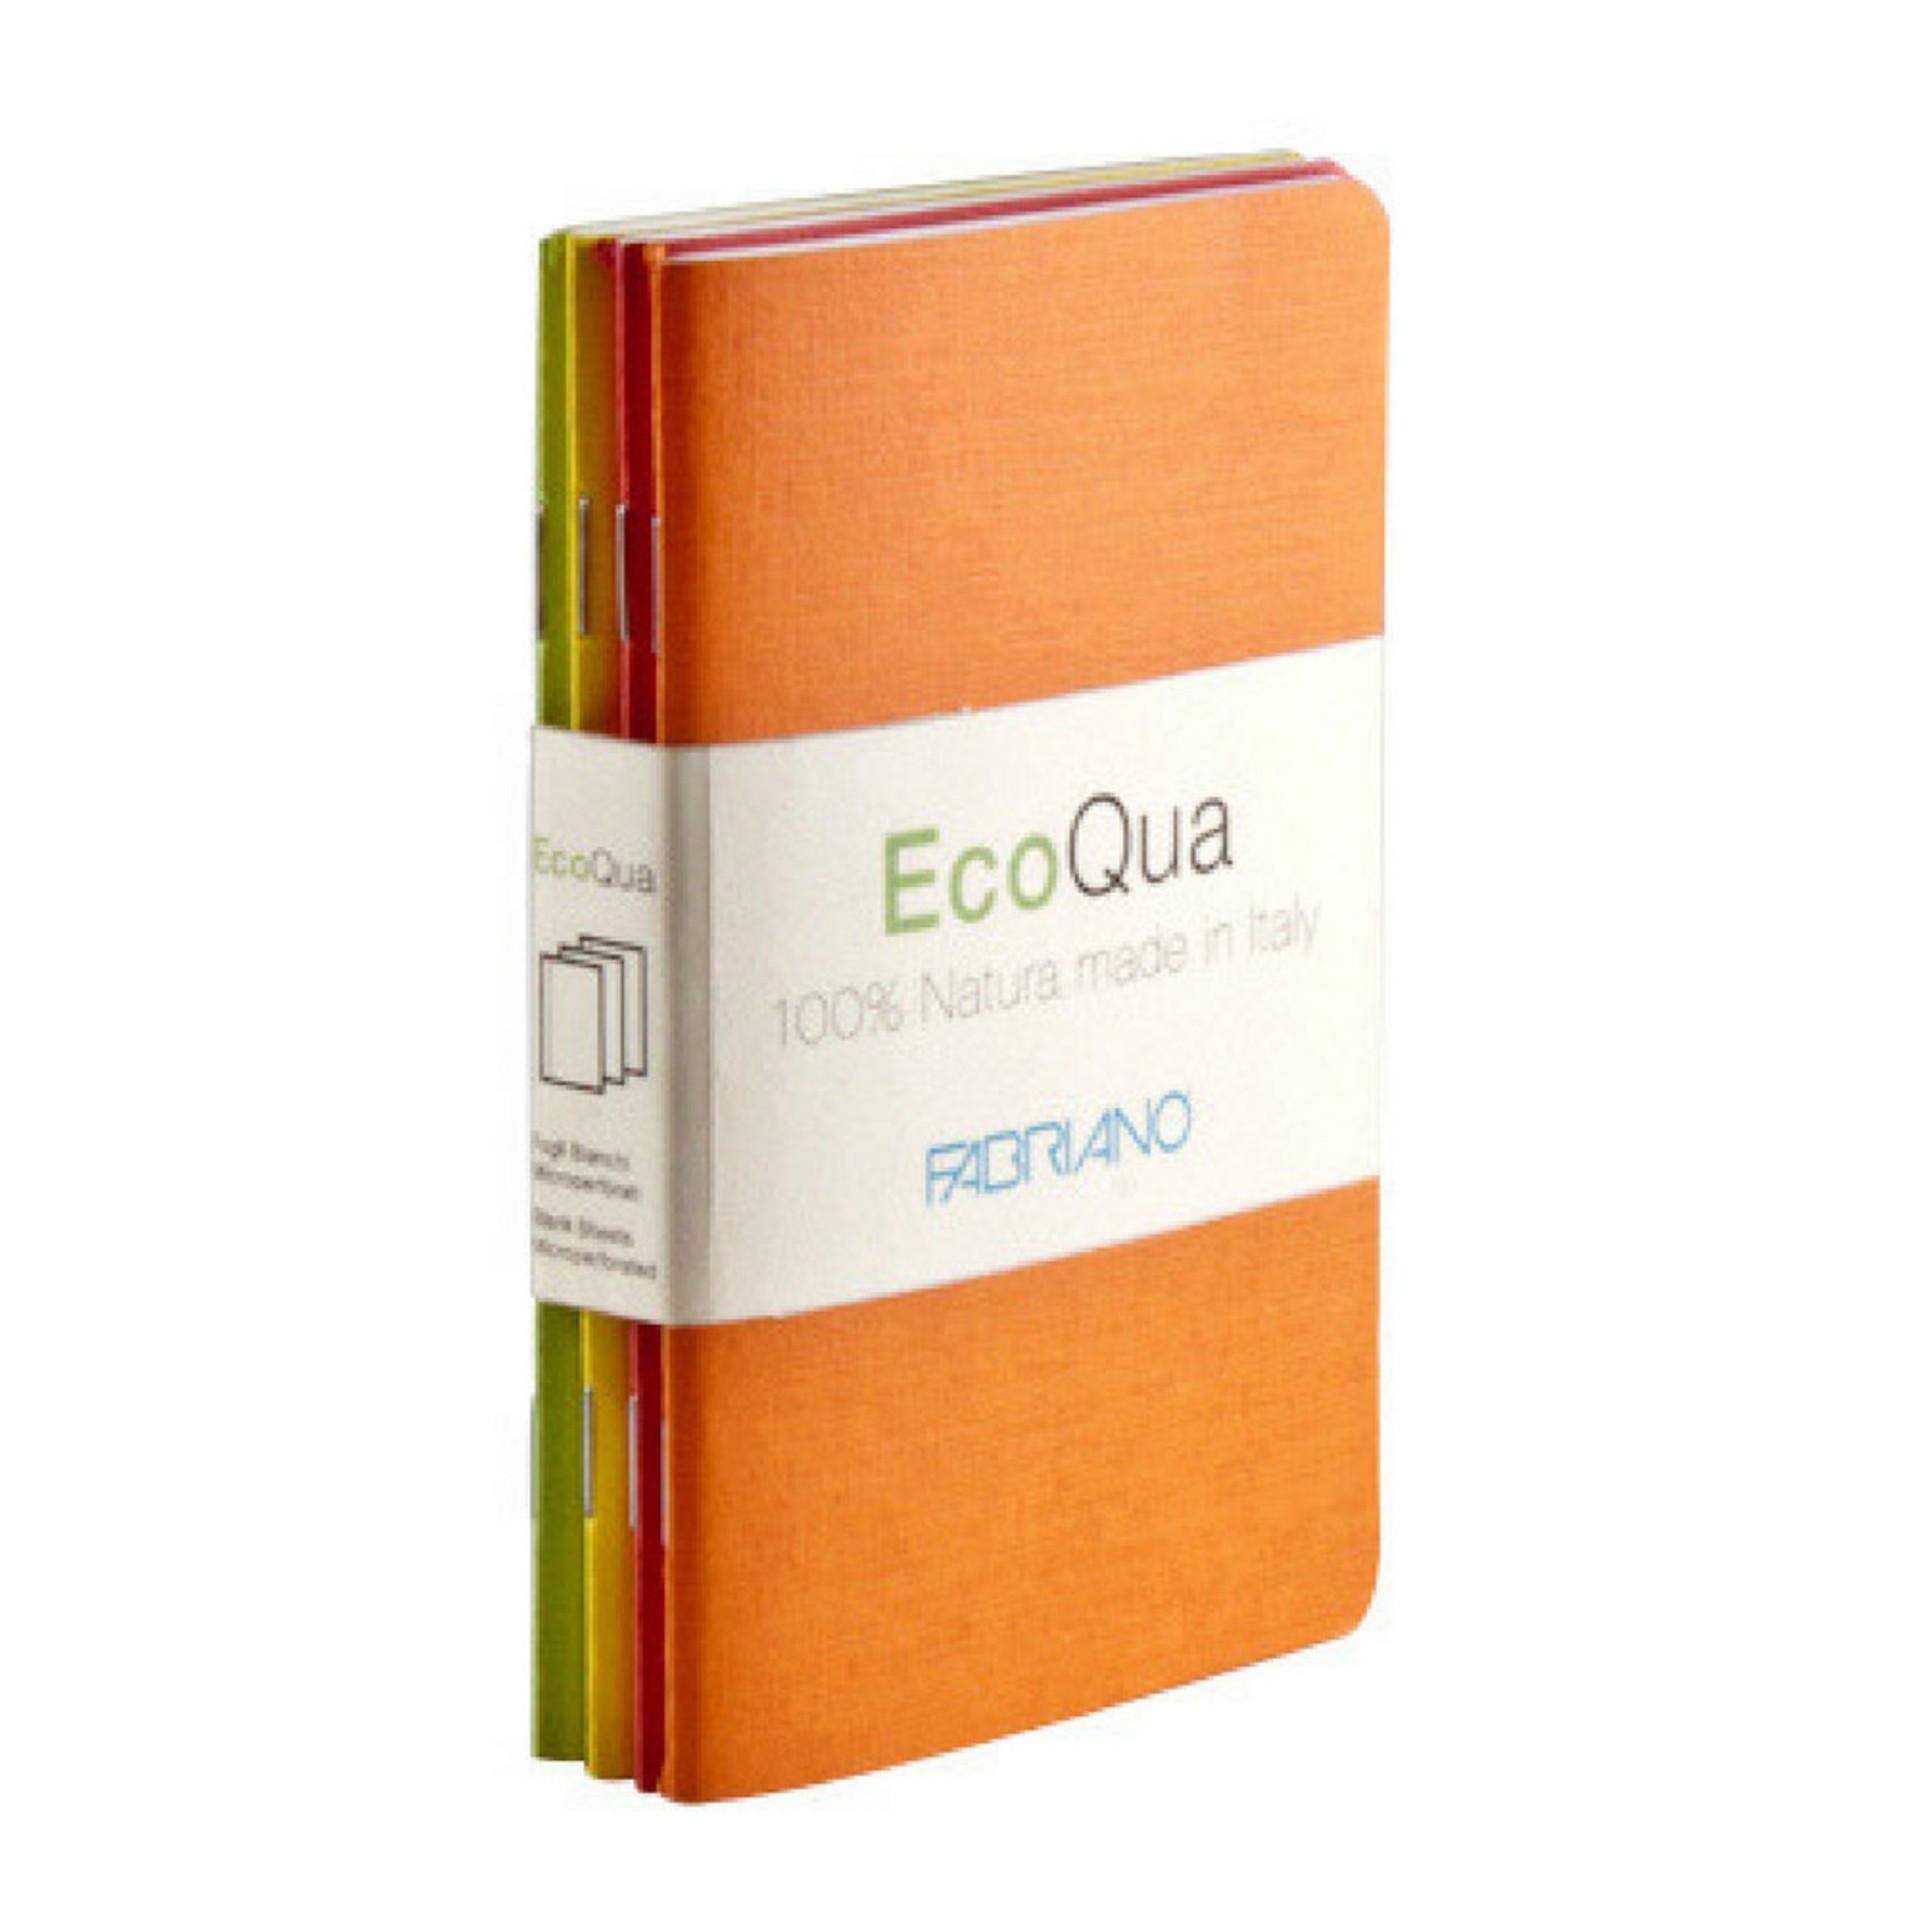 "Fabriano Warm EcoQua 3.5""x5.5"" Blank Stapled Notebook 4 Pack"